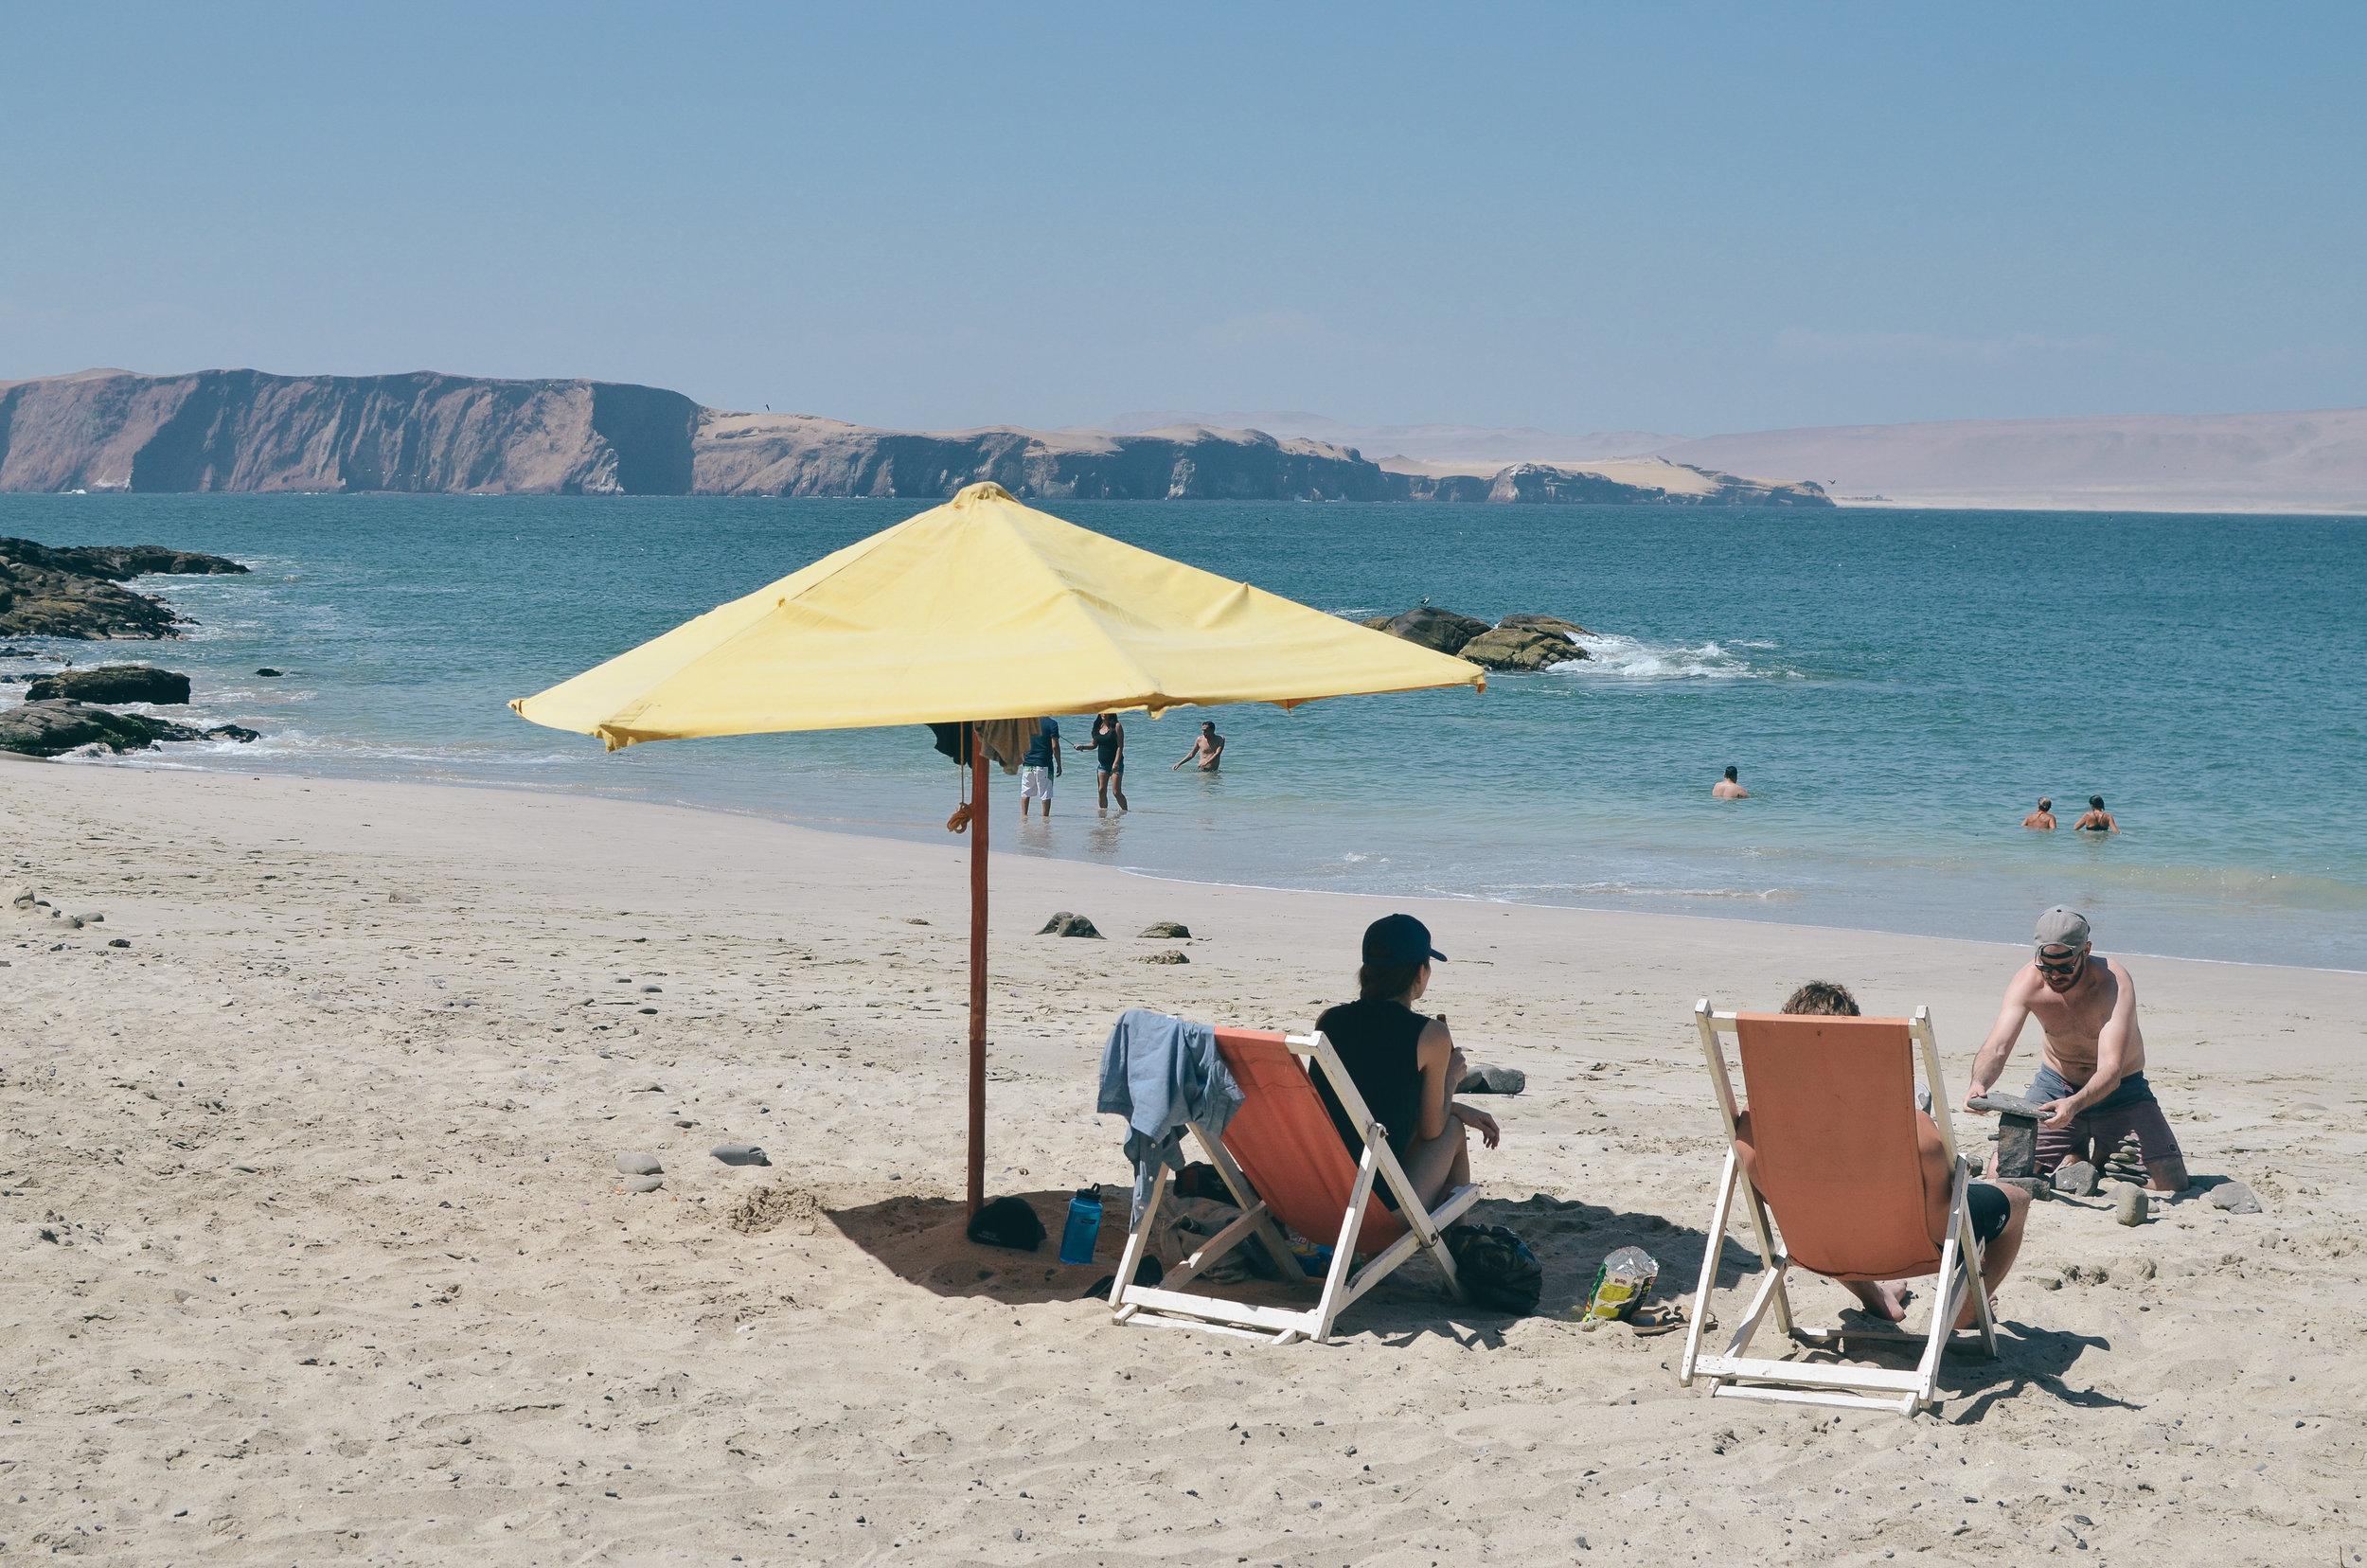 paracas+peru+travel+guide+life+on+pine_DSC_2026.jpg